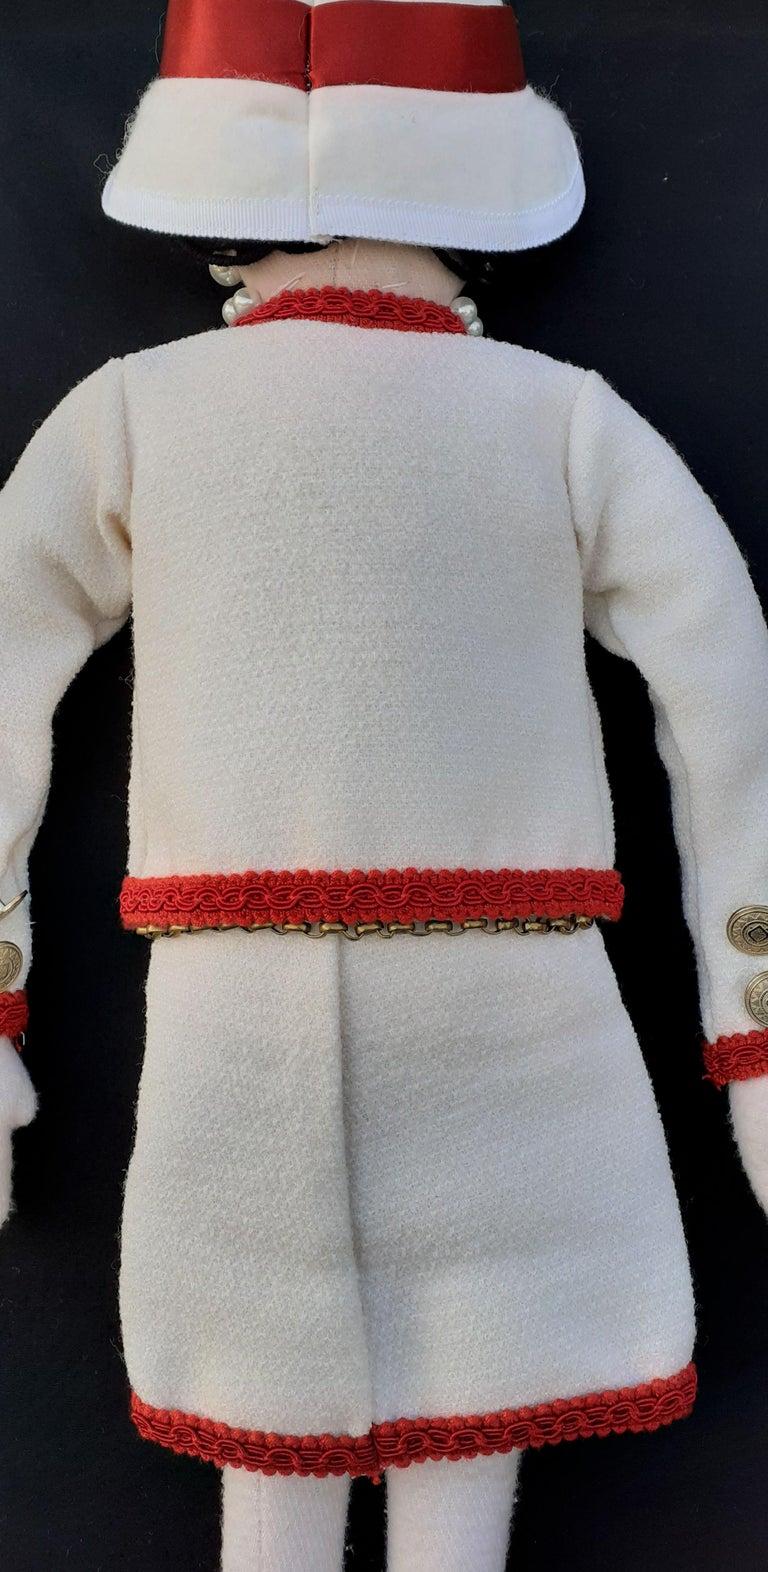 Women's or Men's Gabrielle Chanel La Petite Coco Doll Limited Edition 2010 Chanel Shop Windows For Sale